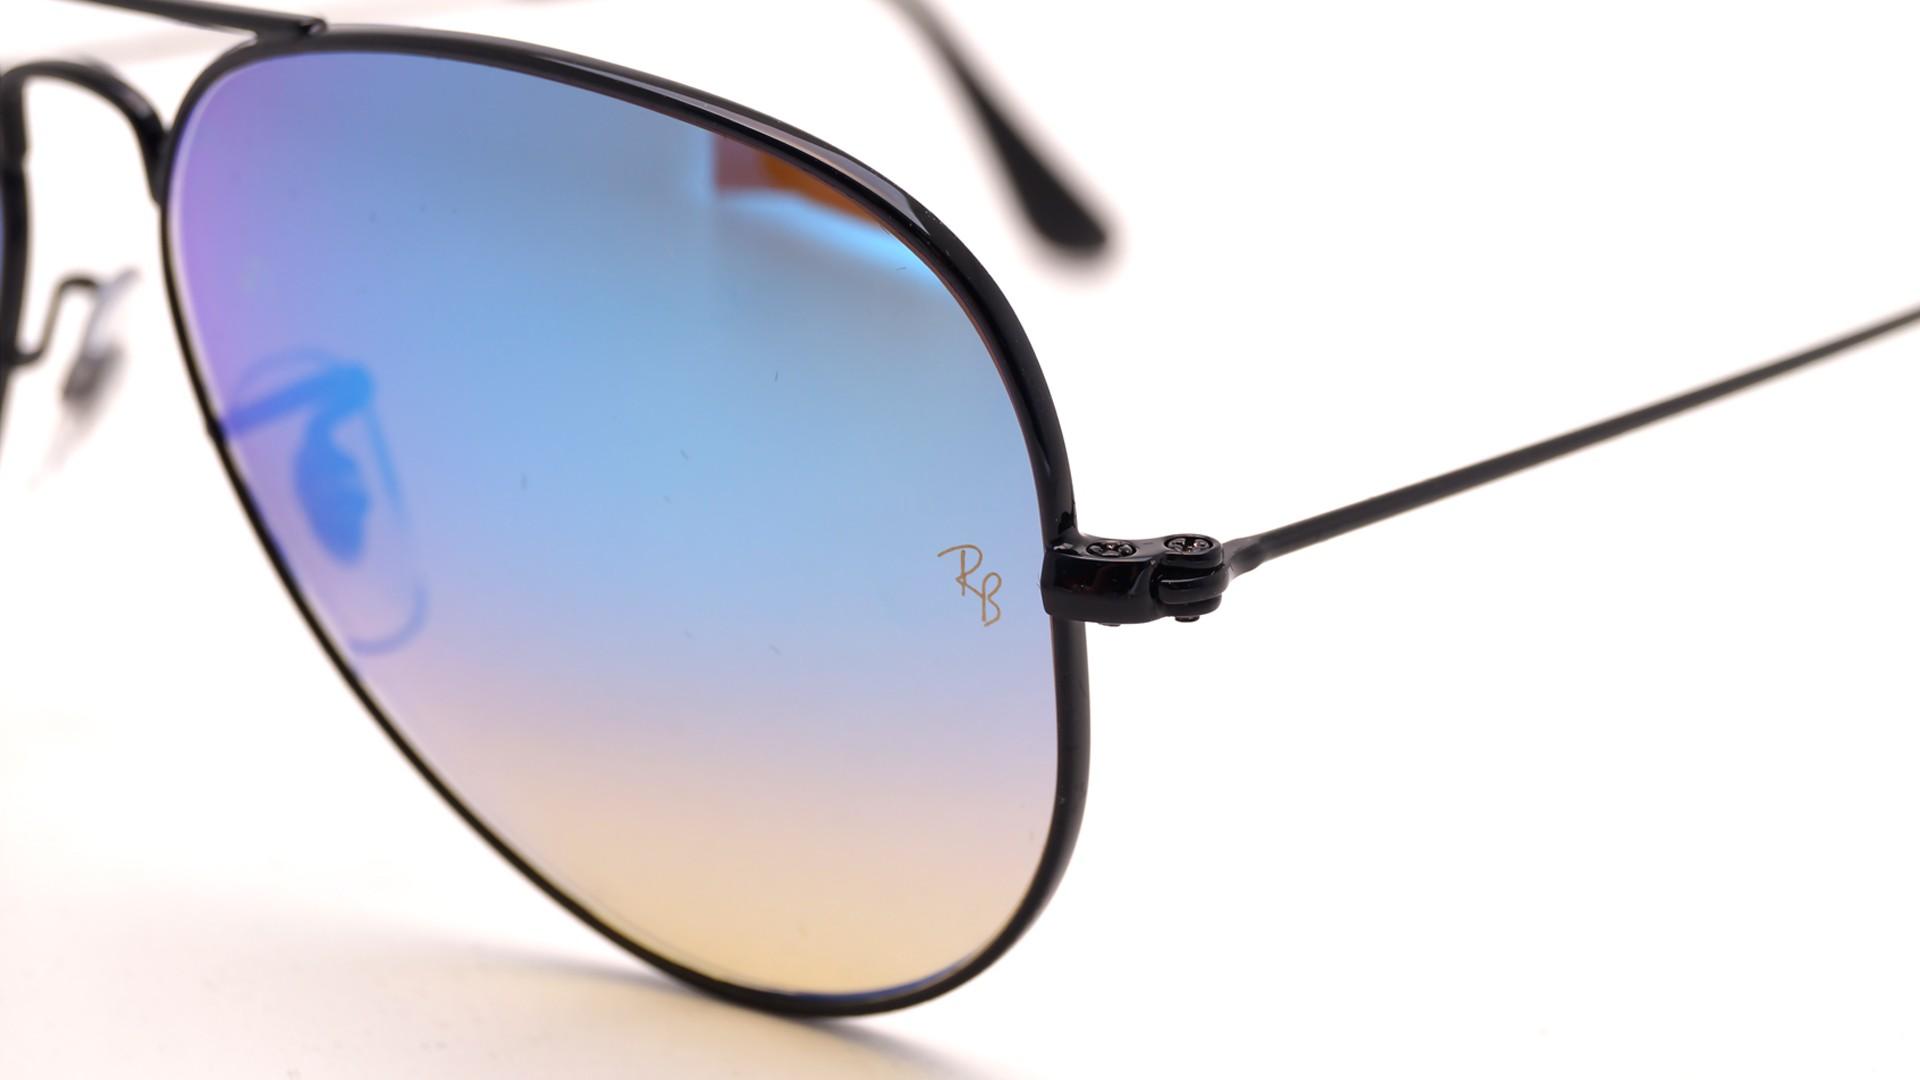 dd30e513d0 Sunglasses Ray-Ban Aviator Large Metal Black RB3025 002 4O 55-14 Medium  Gradient Mirror